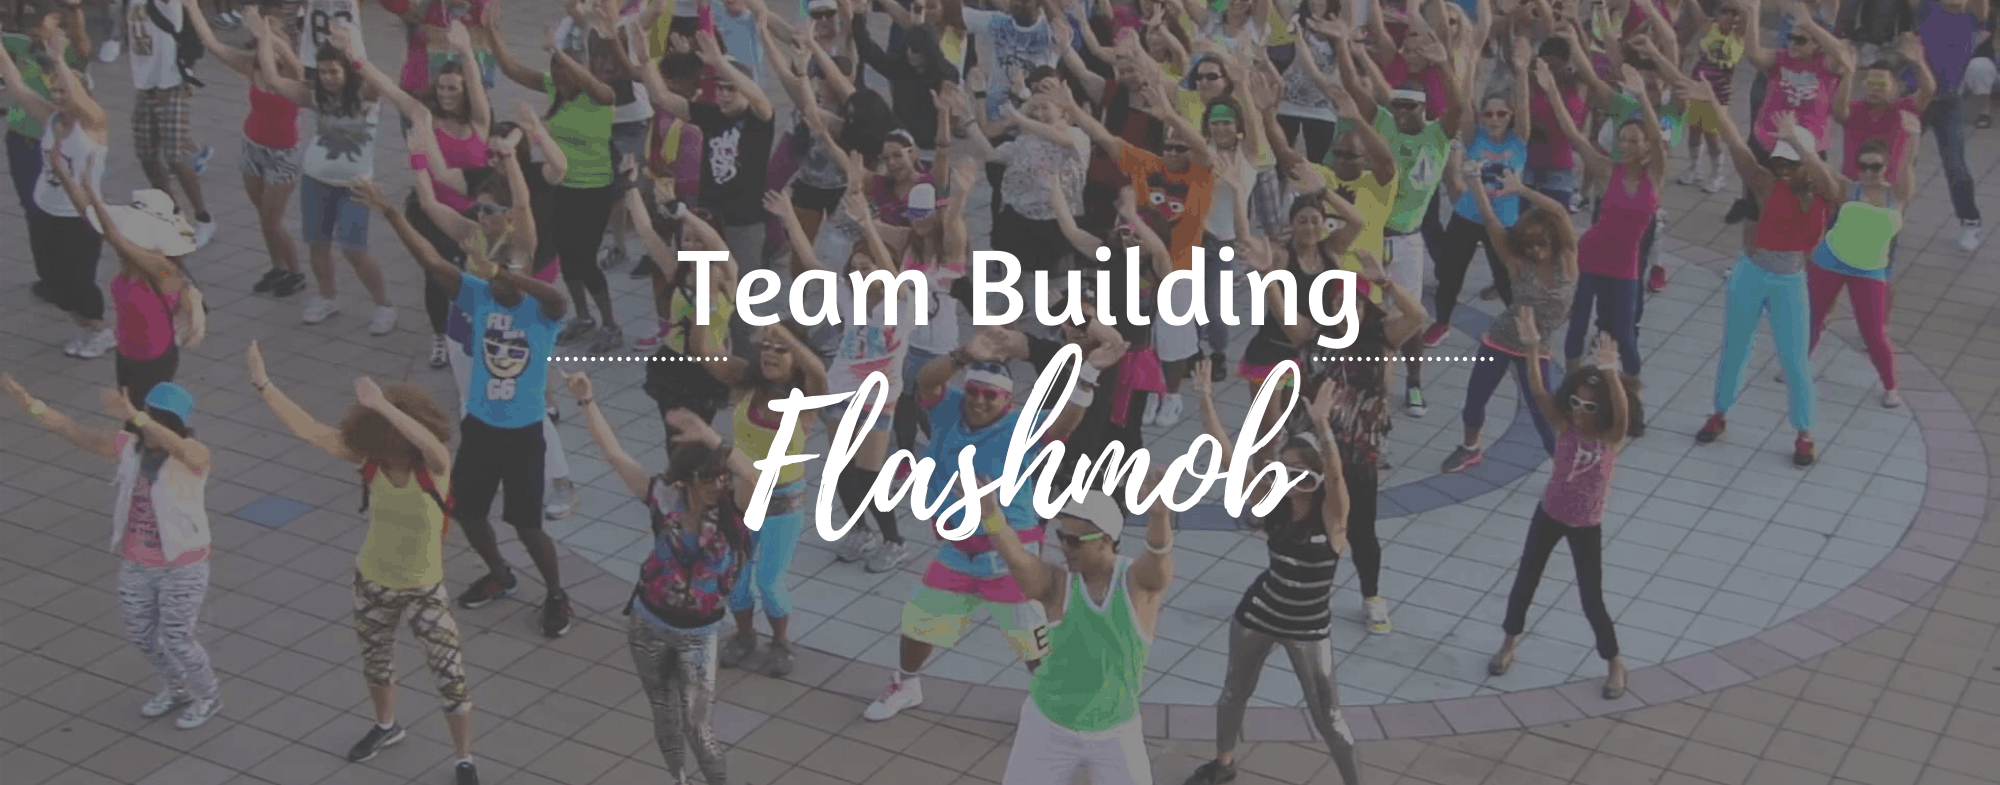 team-building-flashmob